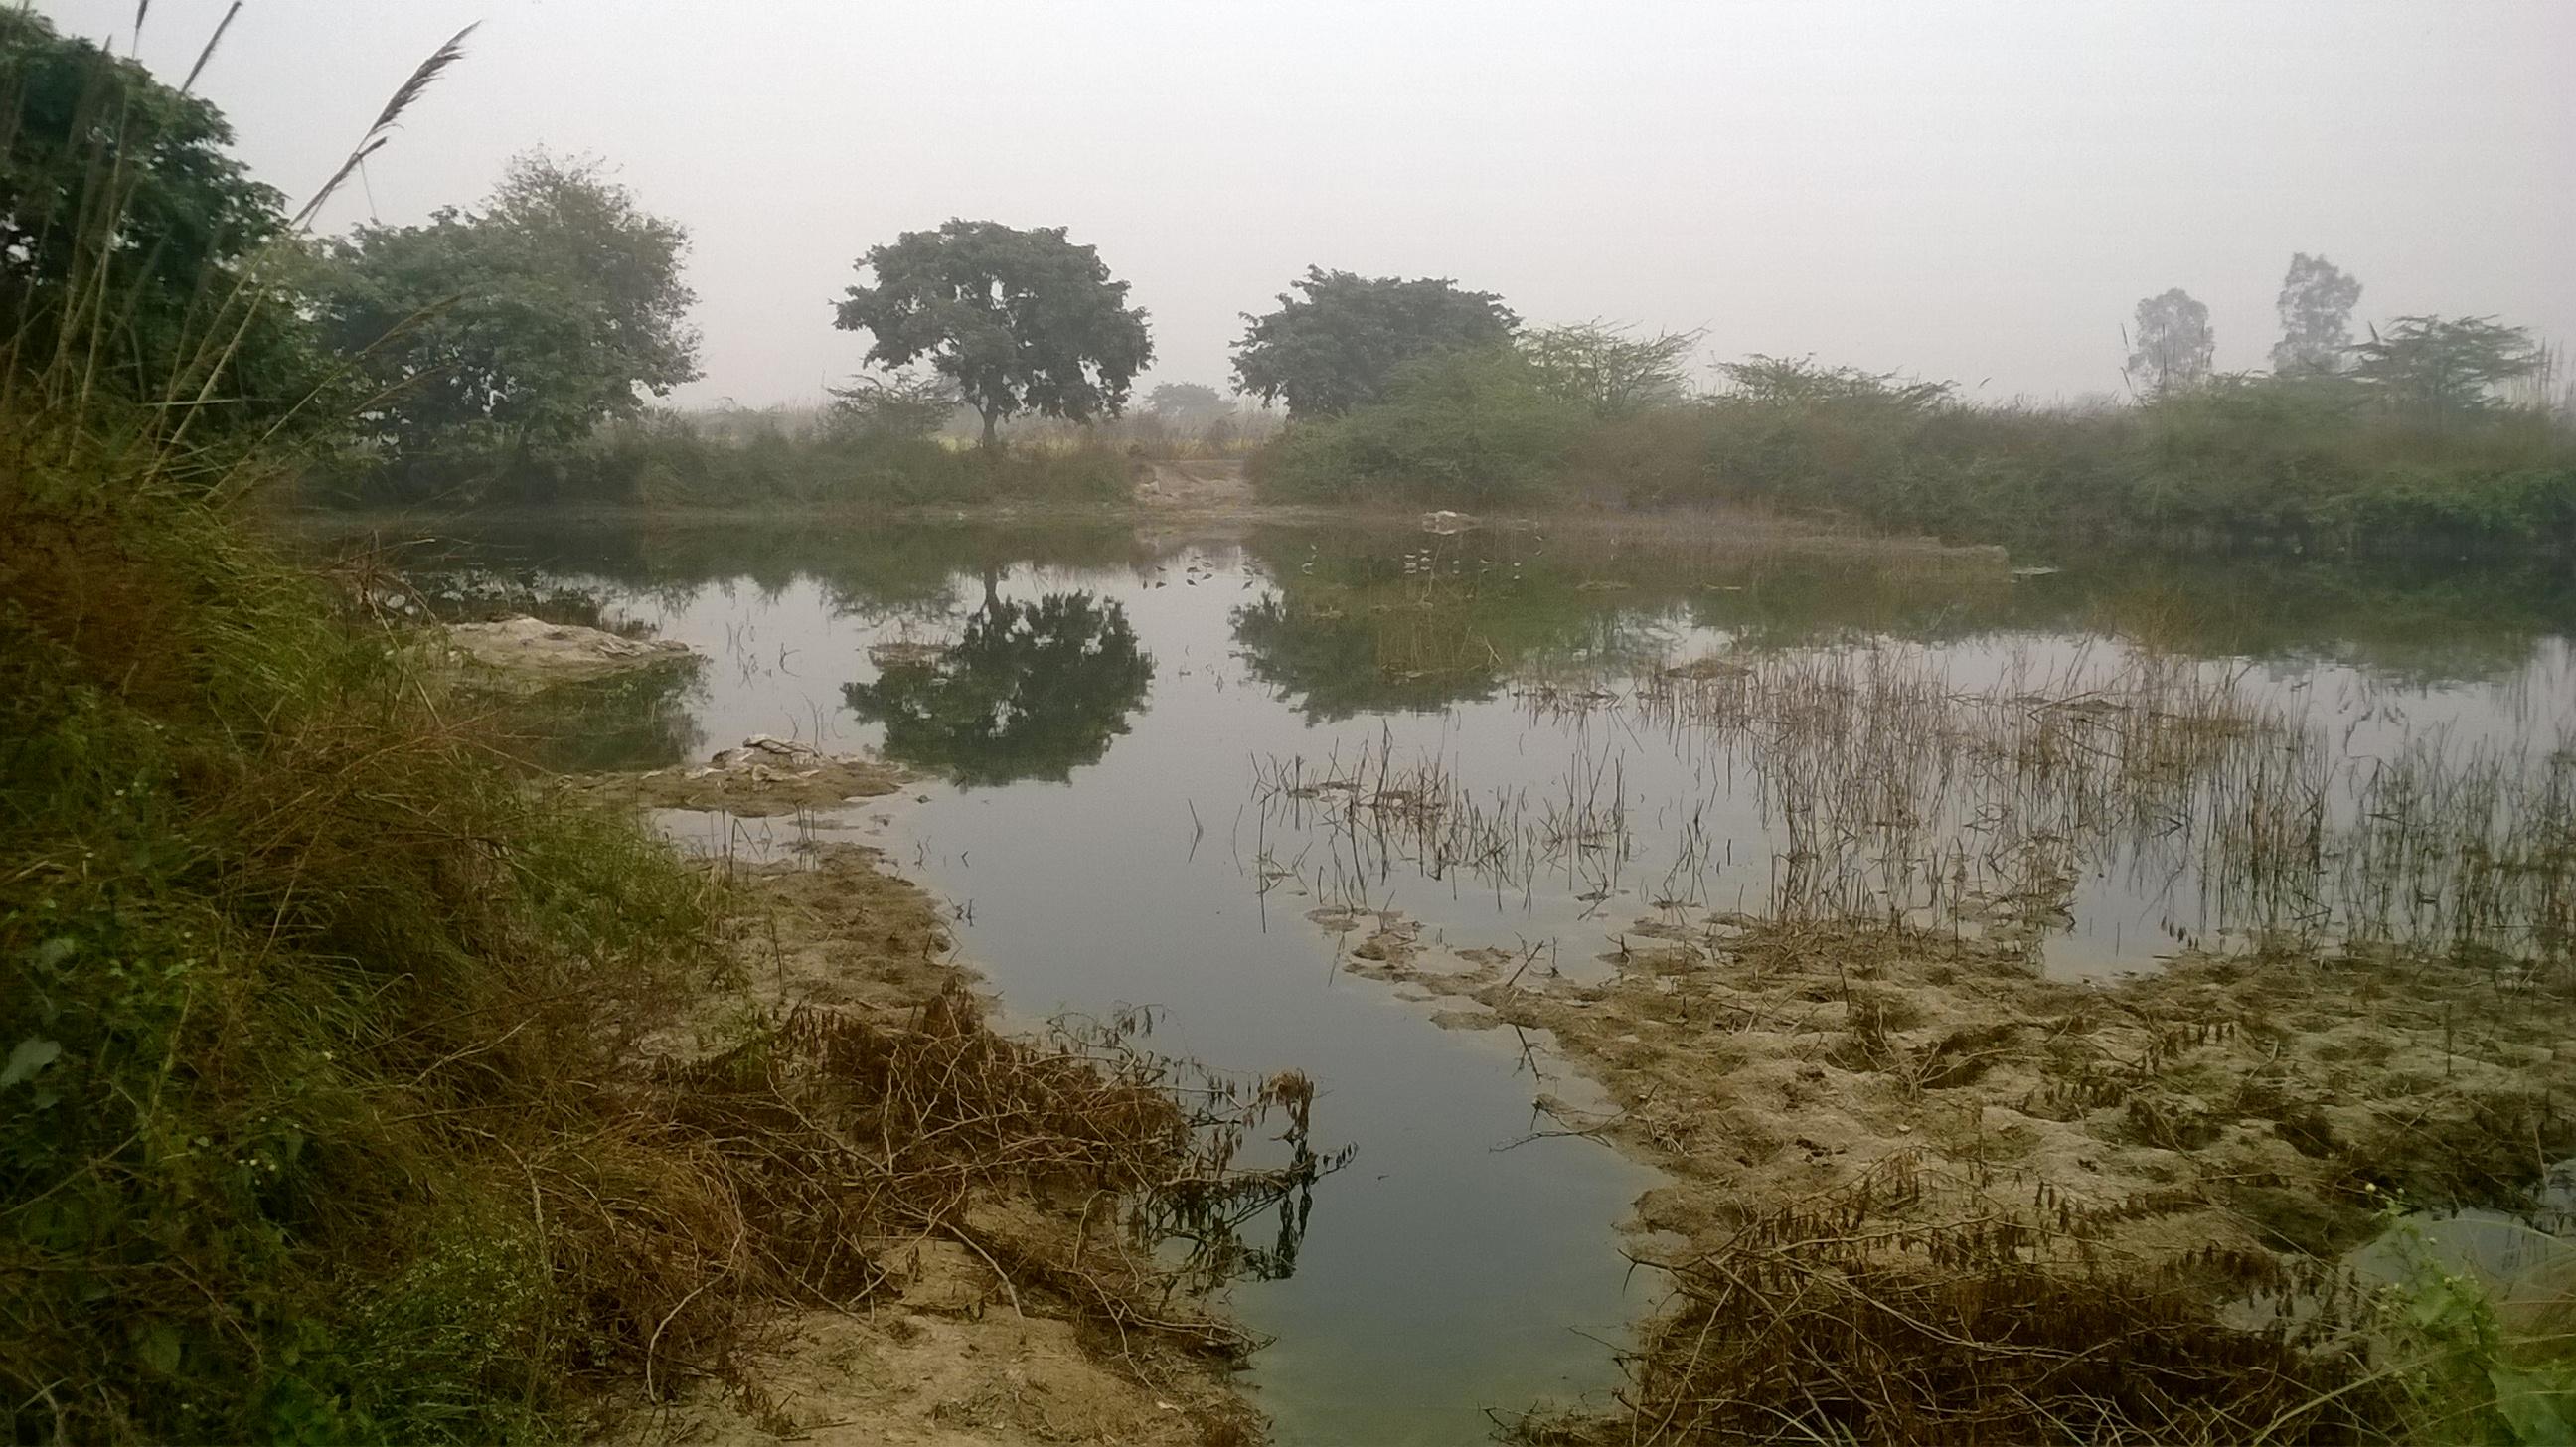 Bawana Site 1